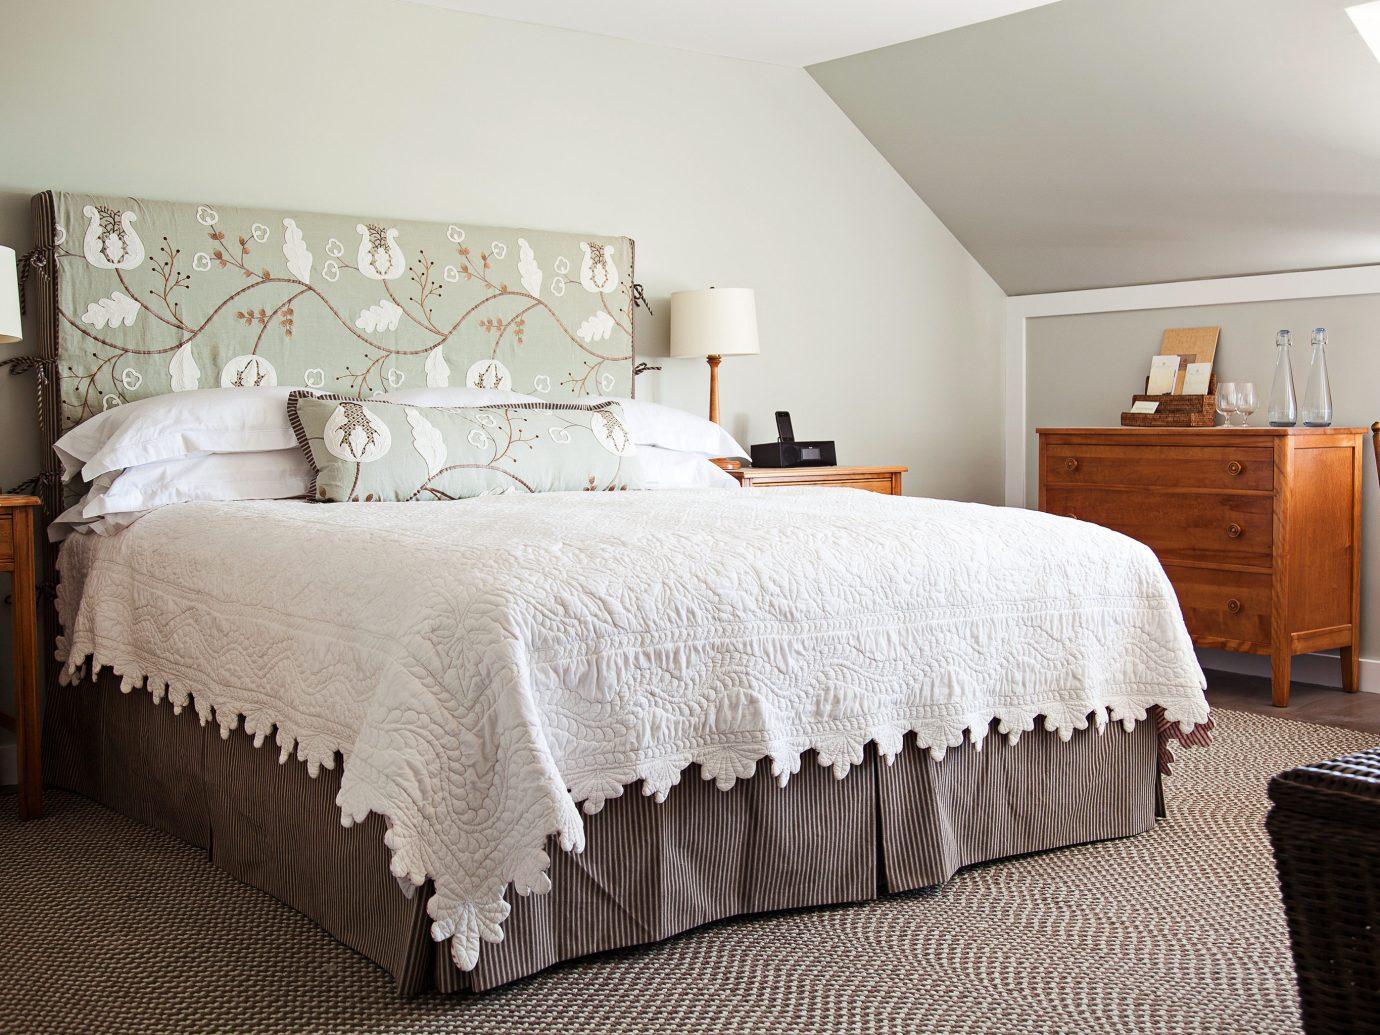 Classic Inn Waterfront bed indoor wall Bedroom room hotel ceiling bed sheet interior design Suite cottage bed frame textile furniture floor duvet cover